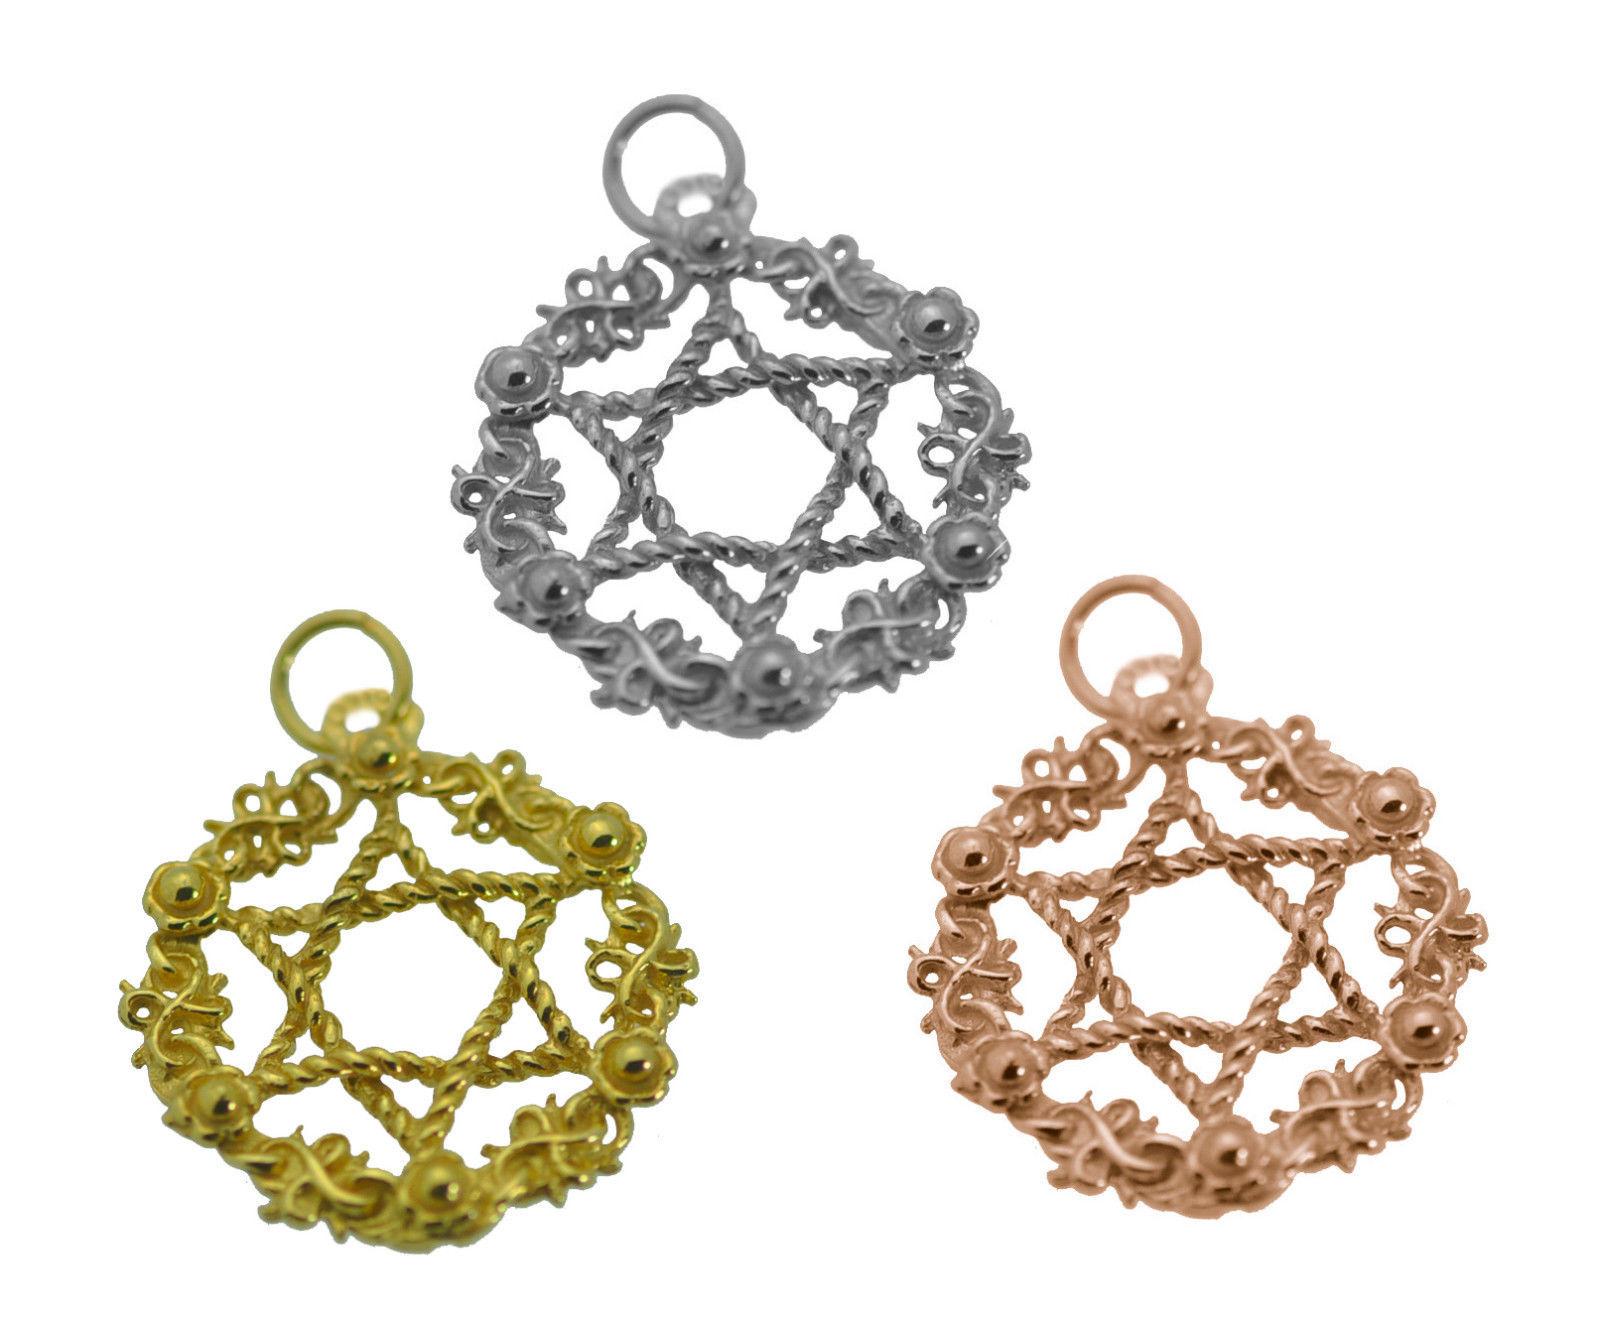 Star of David wreath hanukkah chanukah Rose / Gold Pltd / Sterling silver Charm